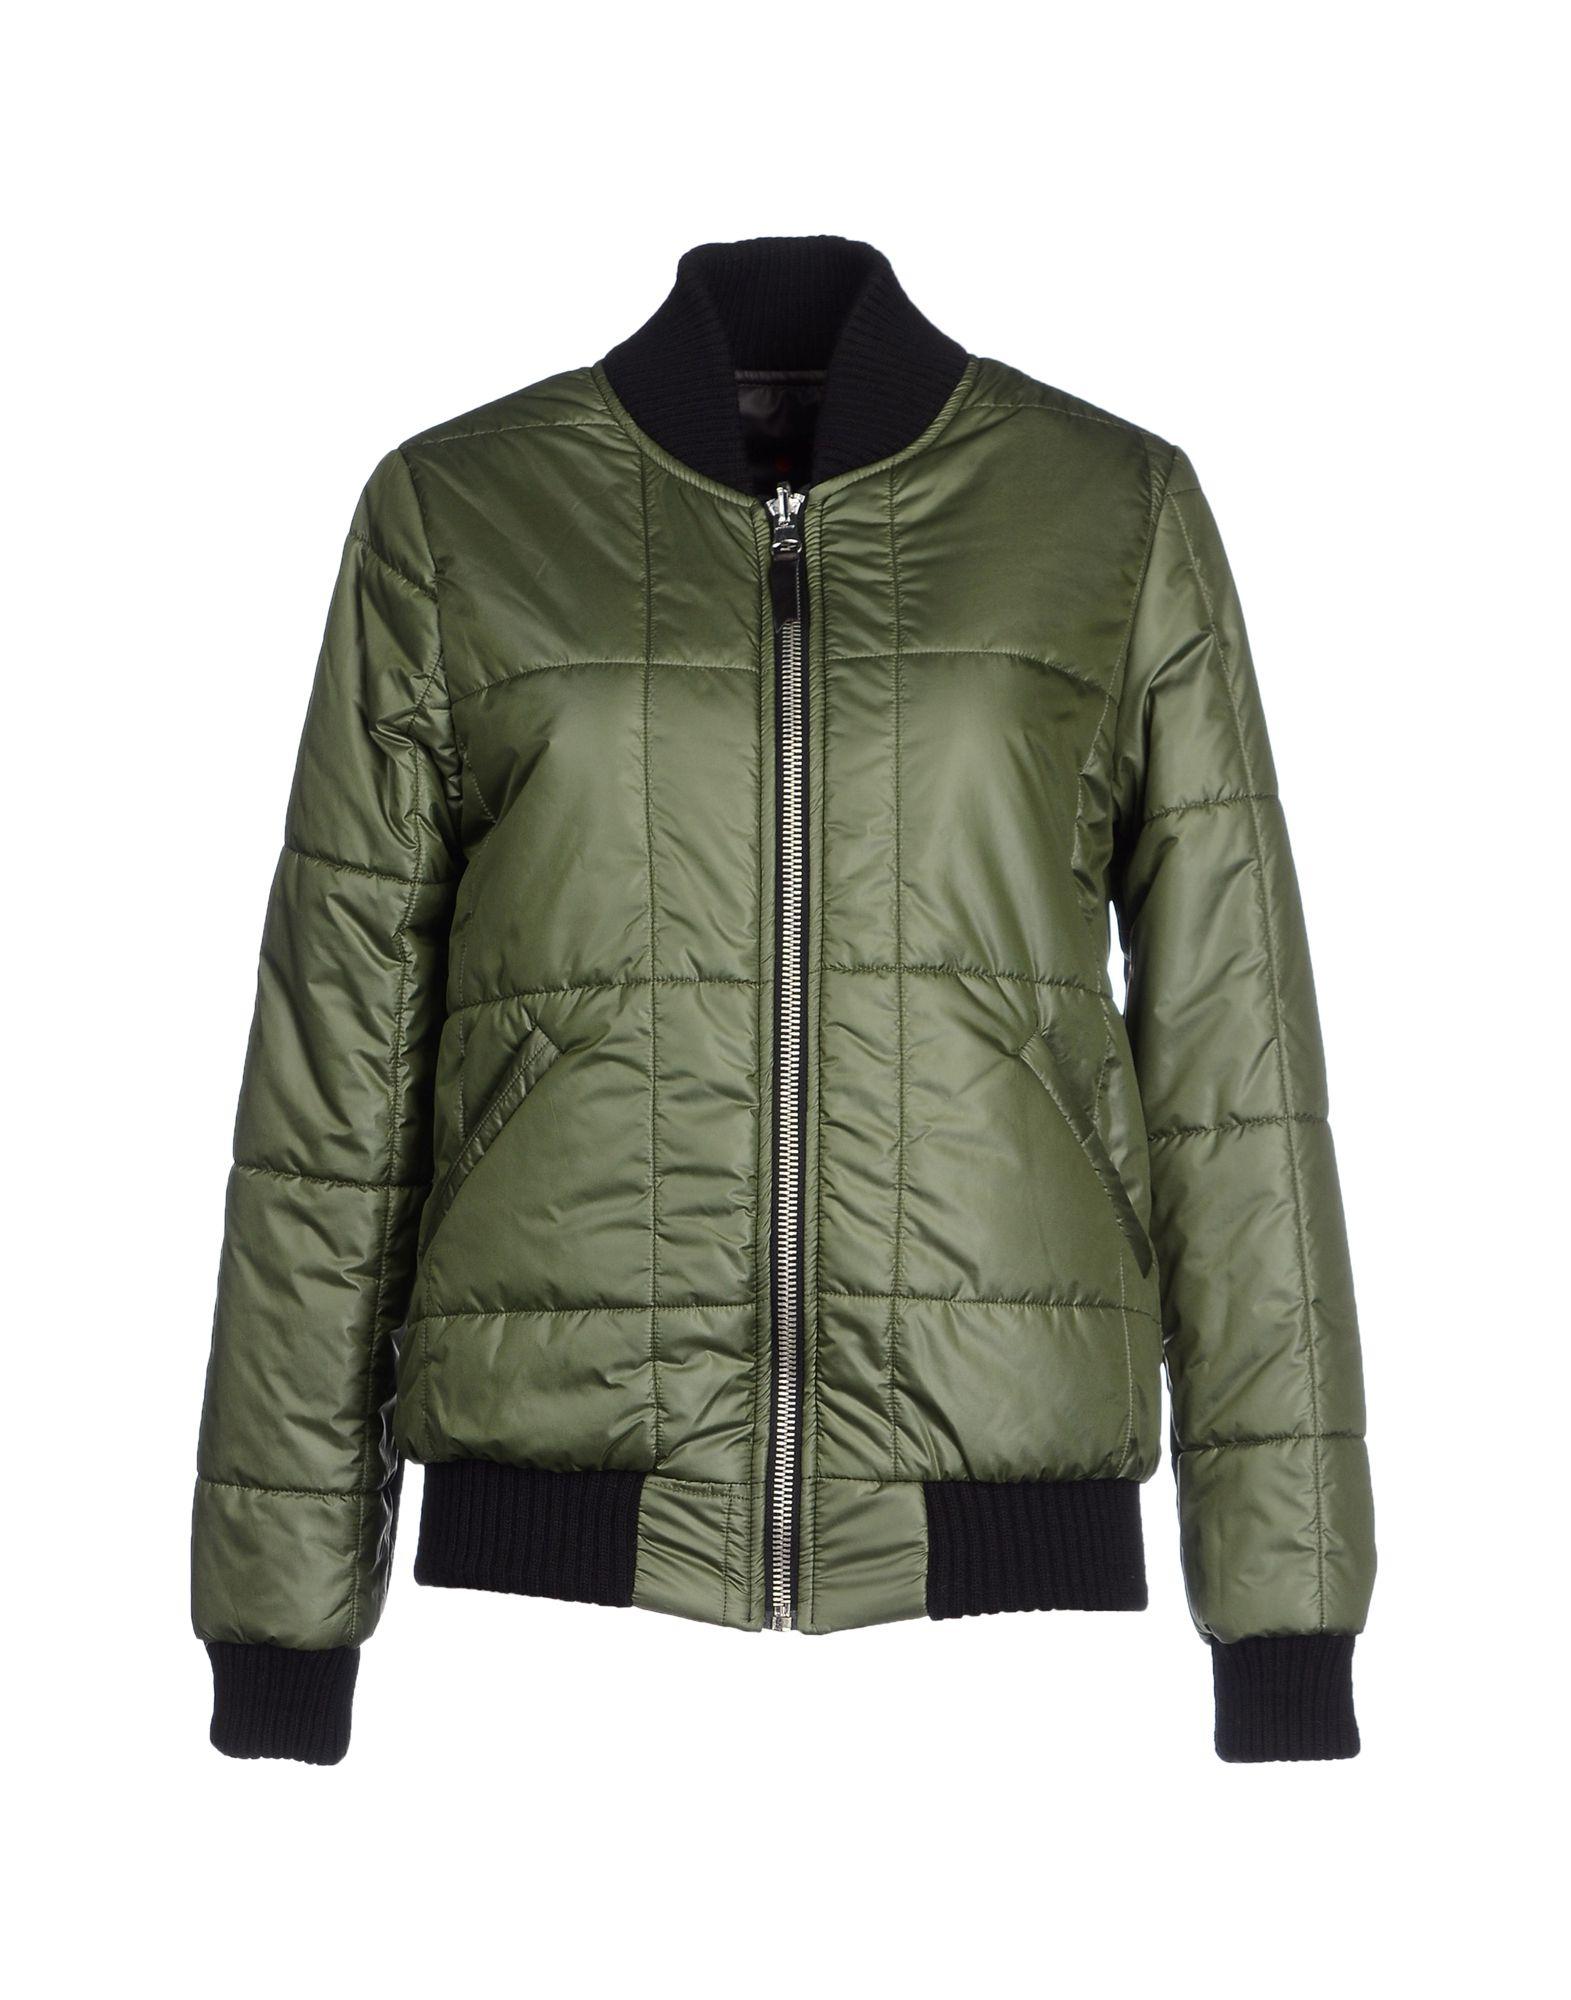 Lyst - Fifteen U0026 Half Jacket In Black For Men